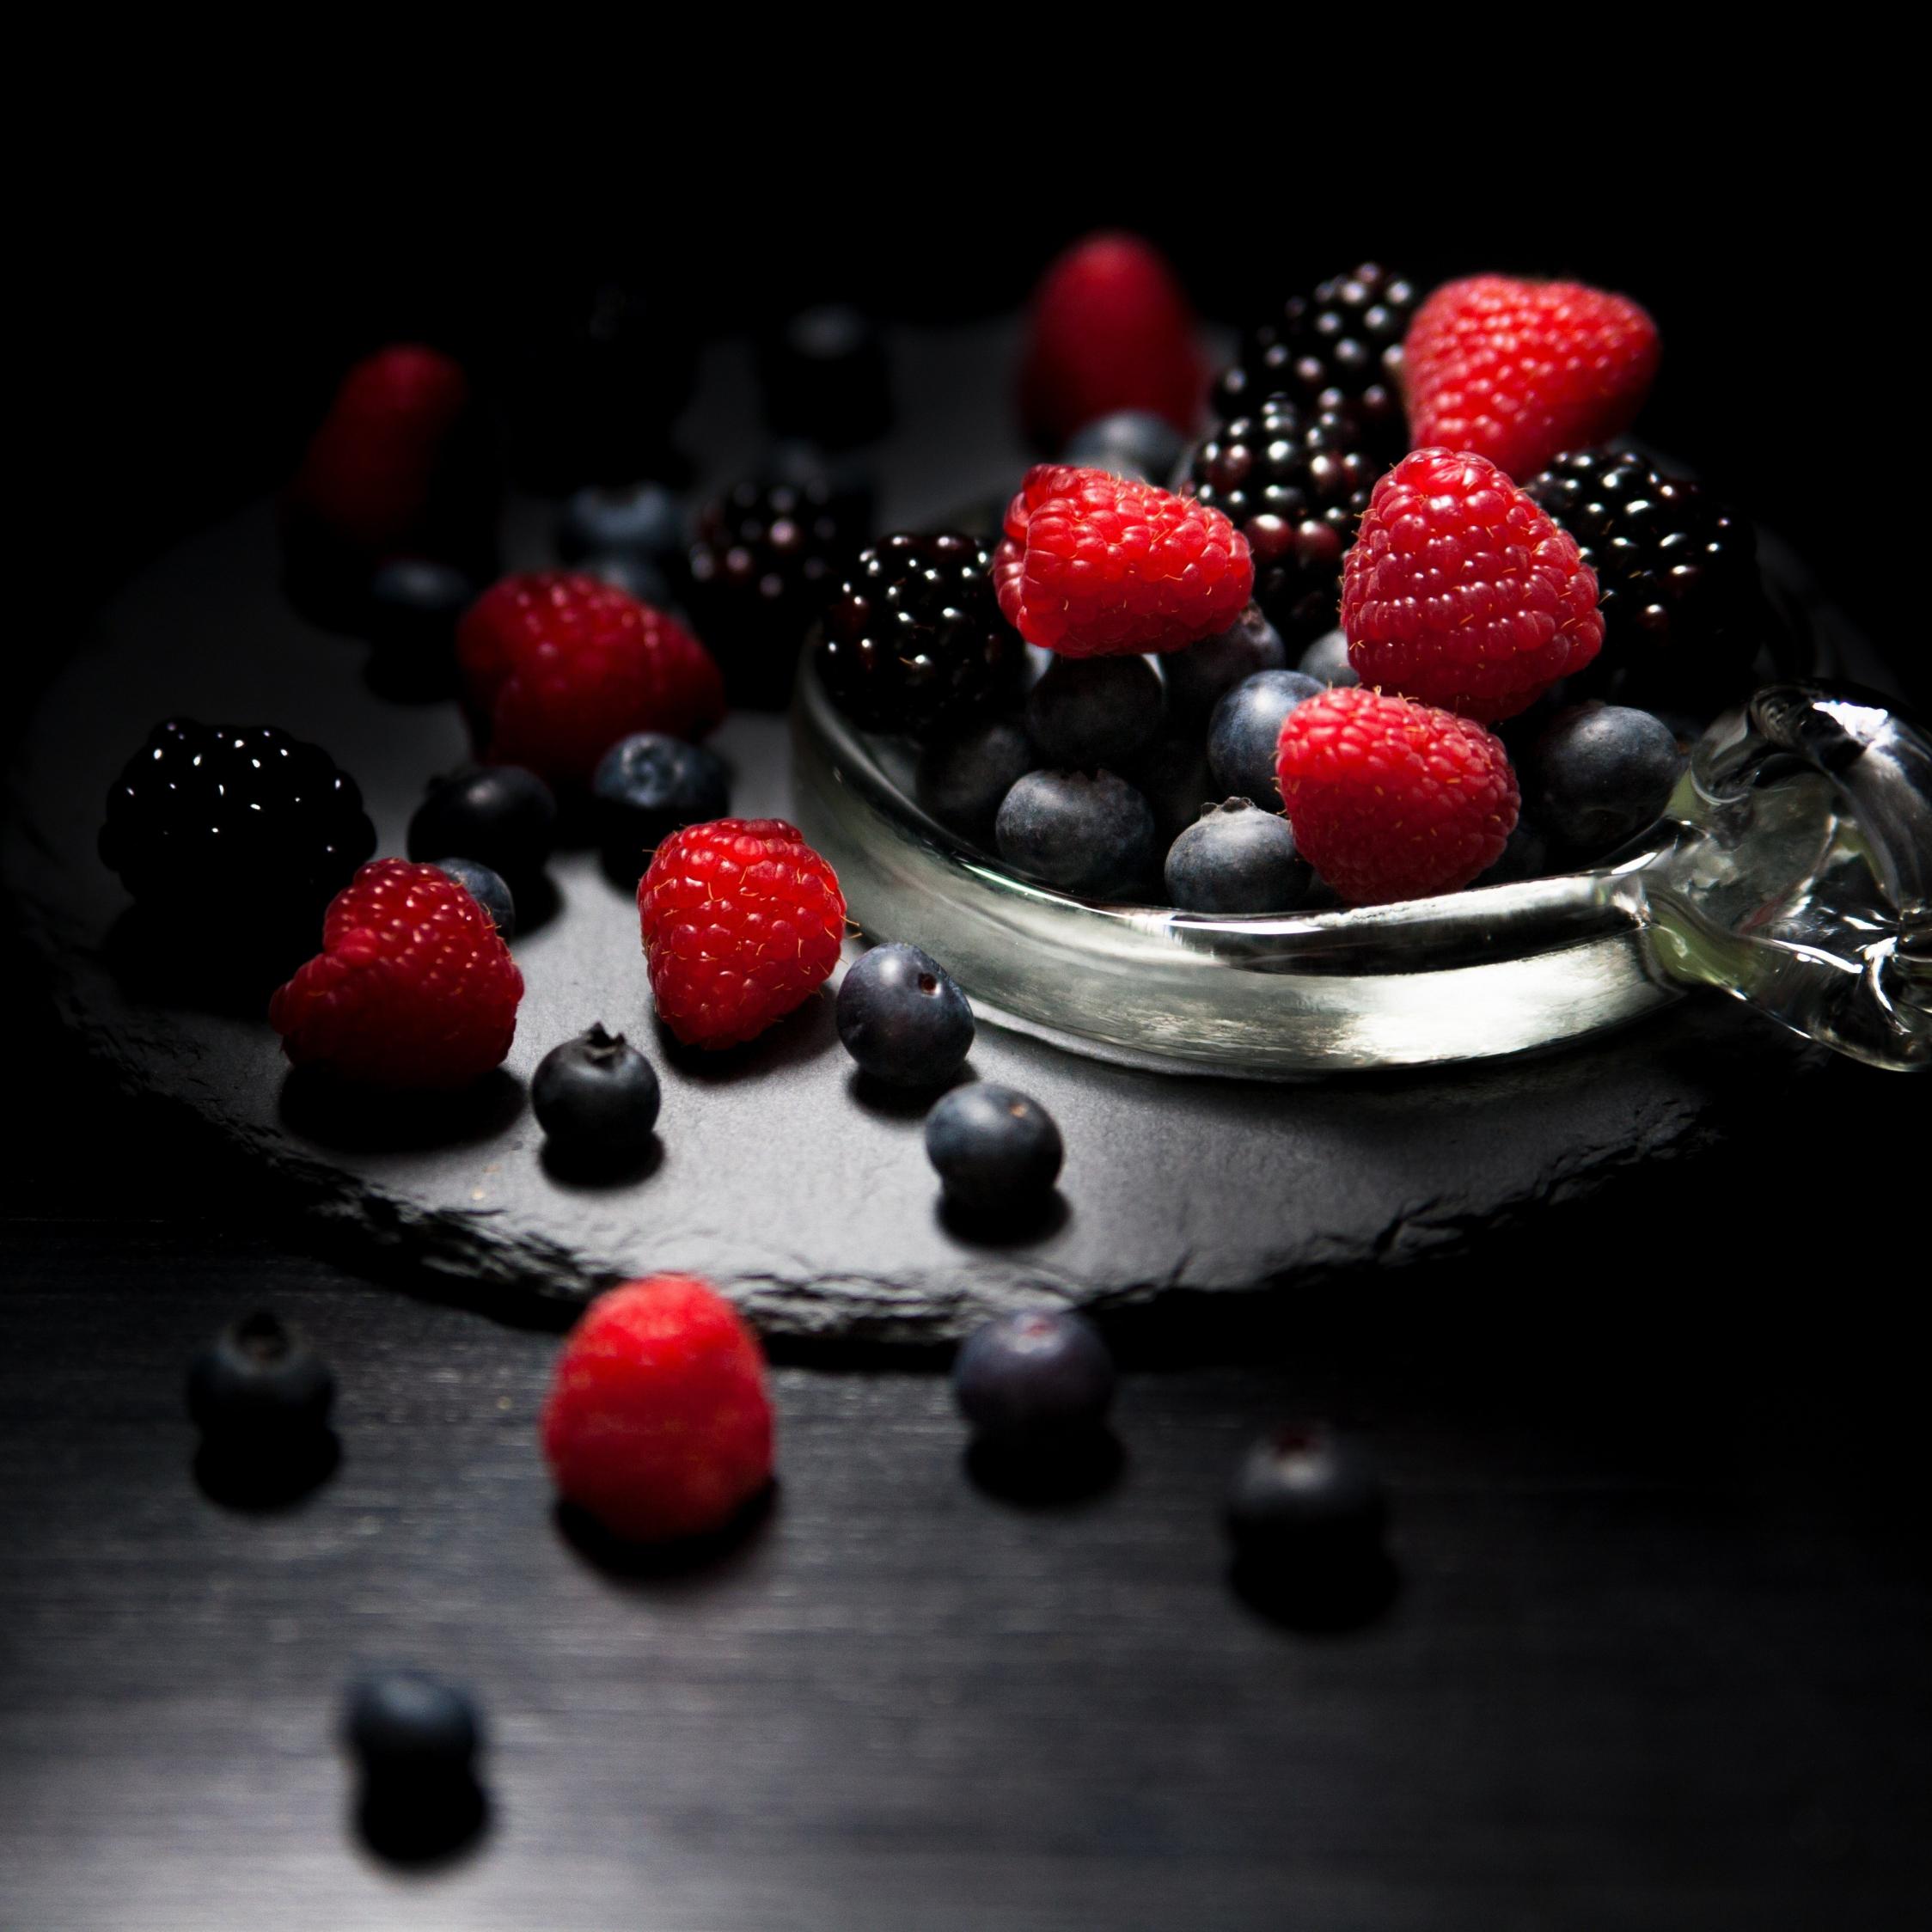 2248x2248 wallpaper Dark mood, food, fruits, blueberry, raspberry, blackberry, 4k